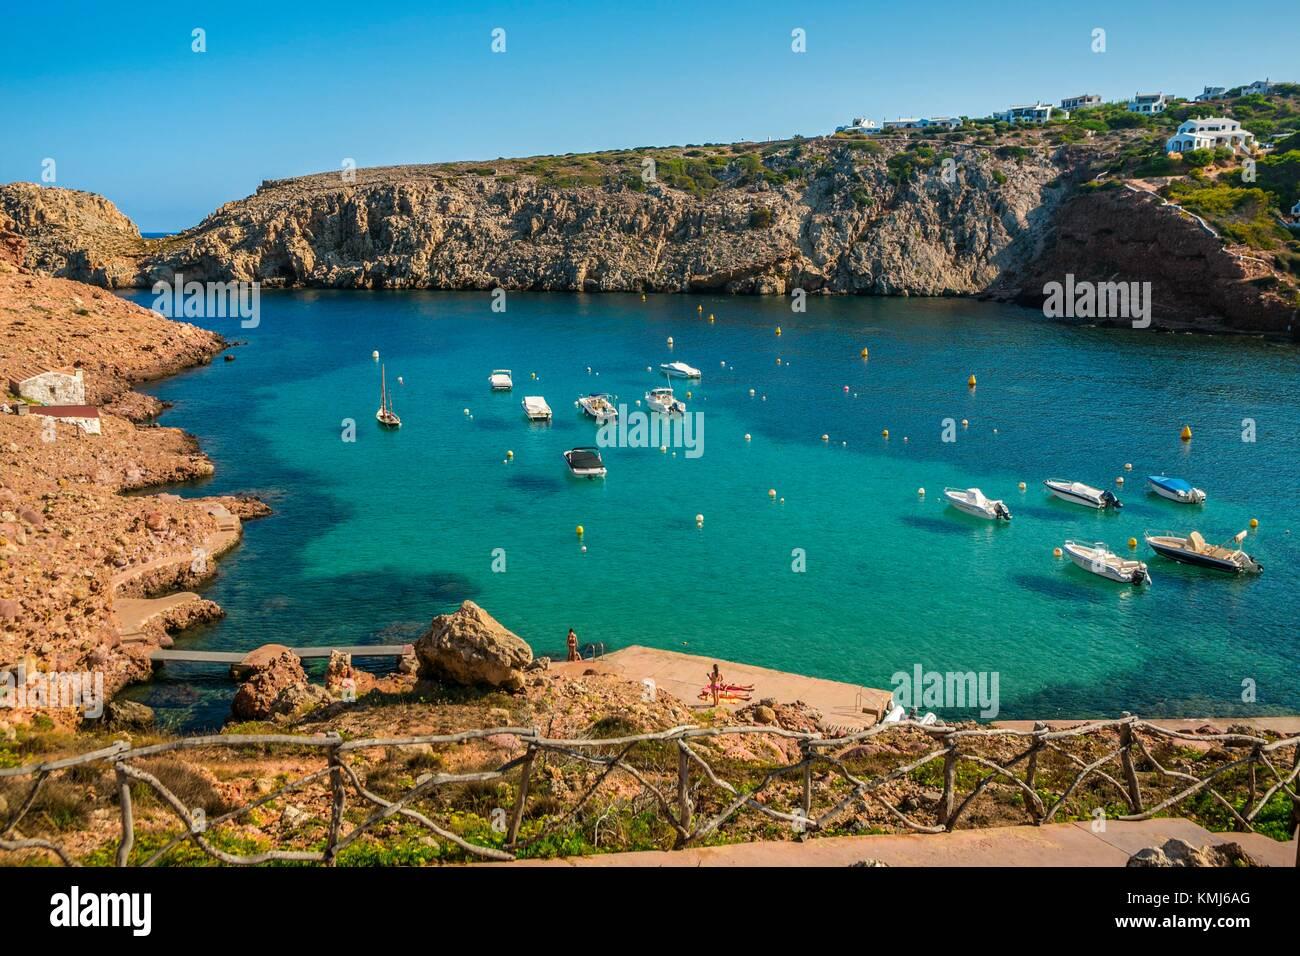 Cala Morell Bay. Ciutadella de Menorca Municipality. Minorca. Balearic Islands. Spain Stock Photo